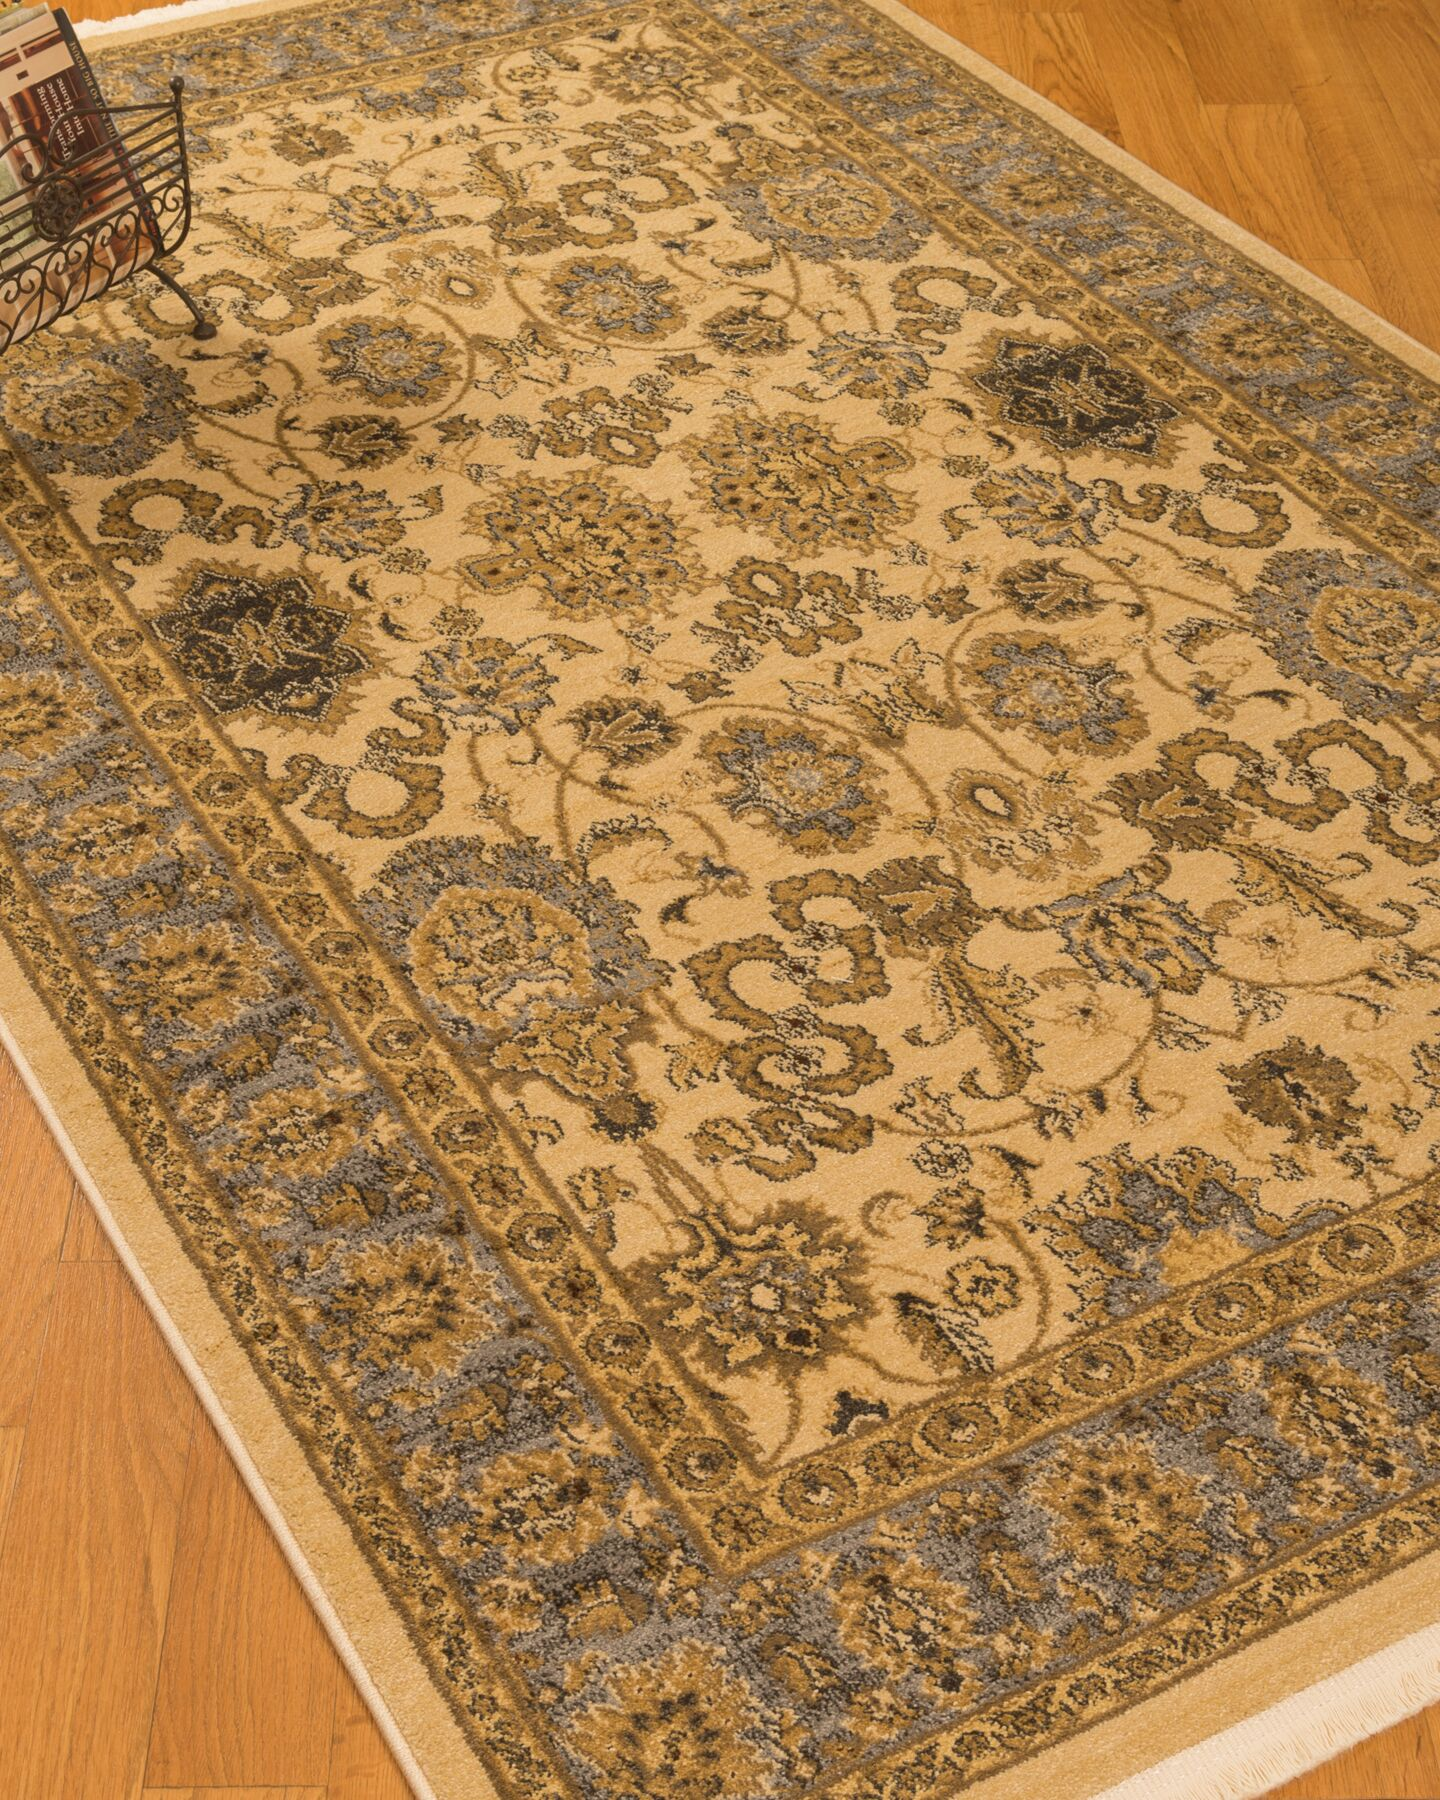 Turkish Beaufort Beige/Brown Area Rug Rug Size: Rectangle 8' x 10'